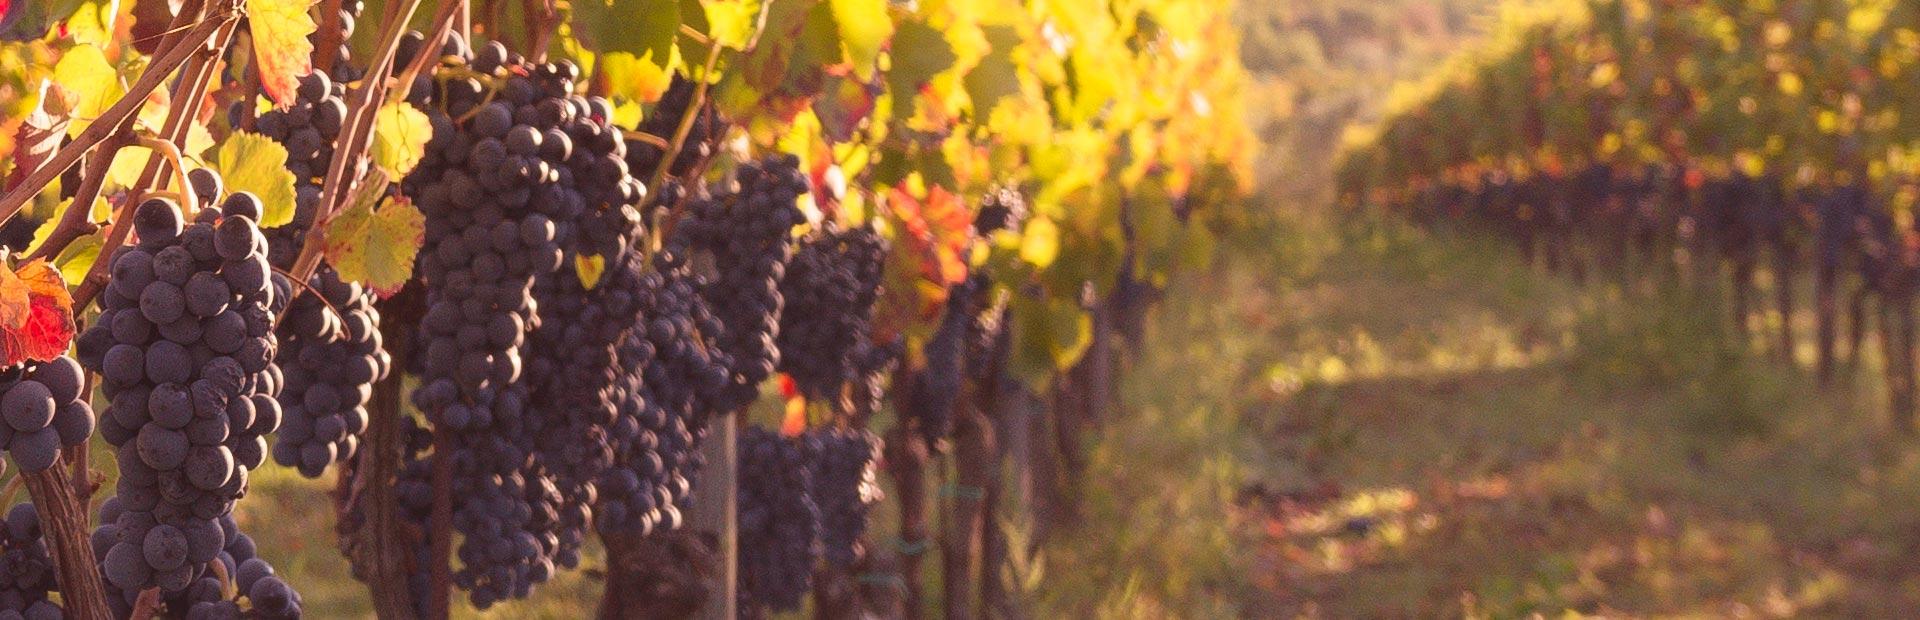 fattoria pagano schede vini_gaurasi